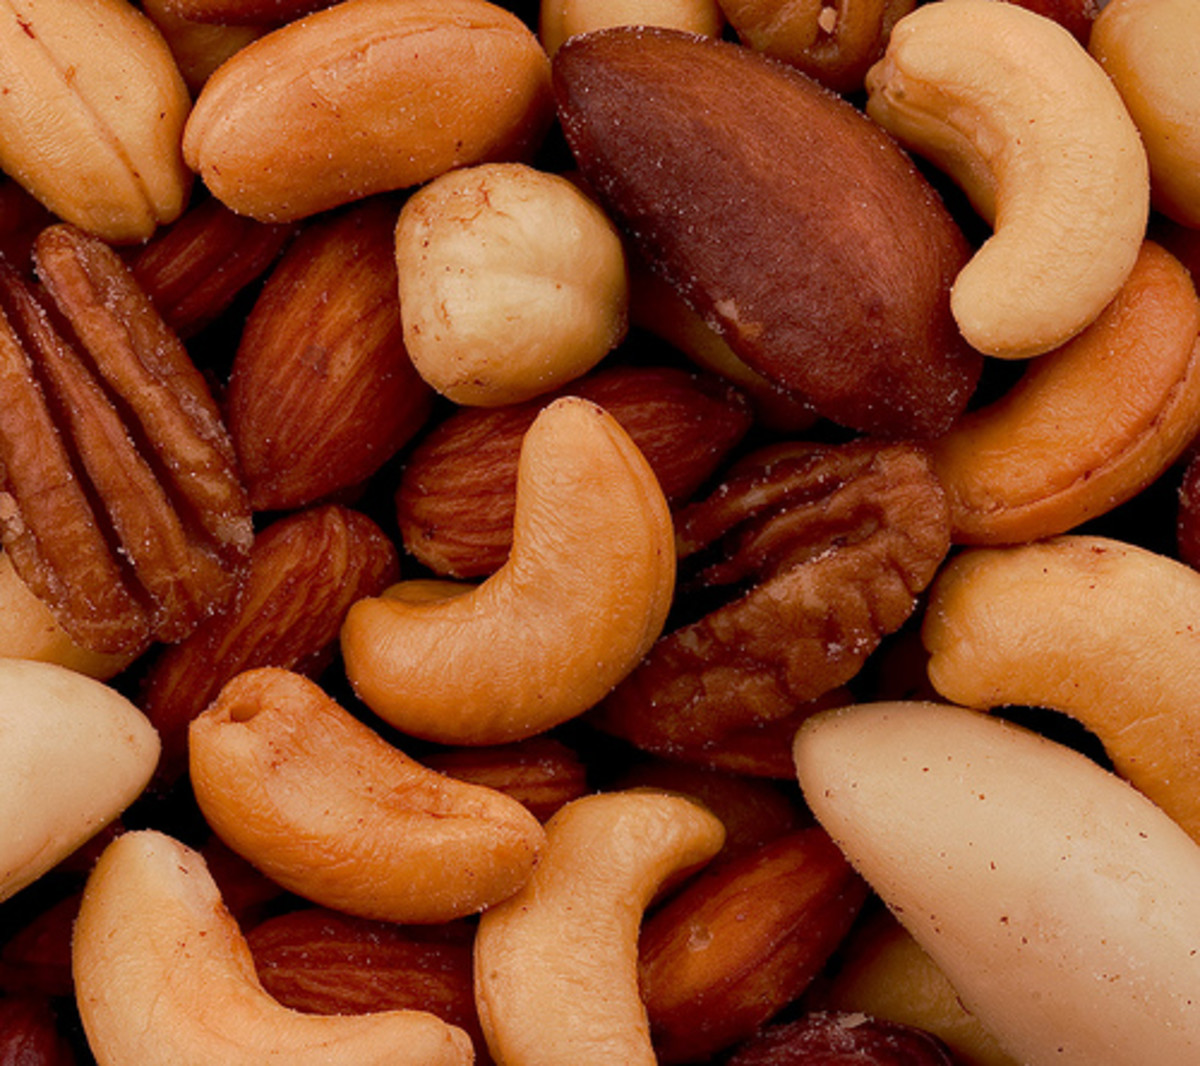 Mixed nuts- pecans, cashews, Brazil nuts